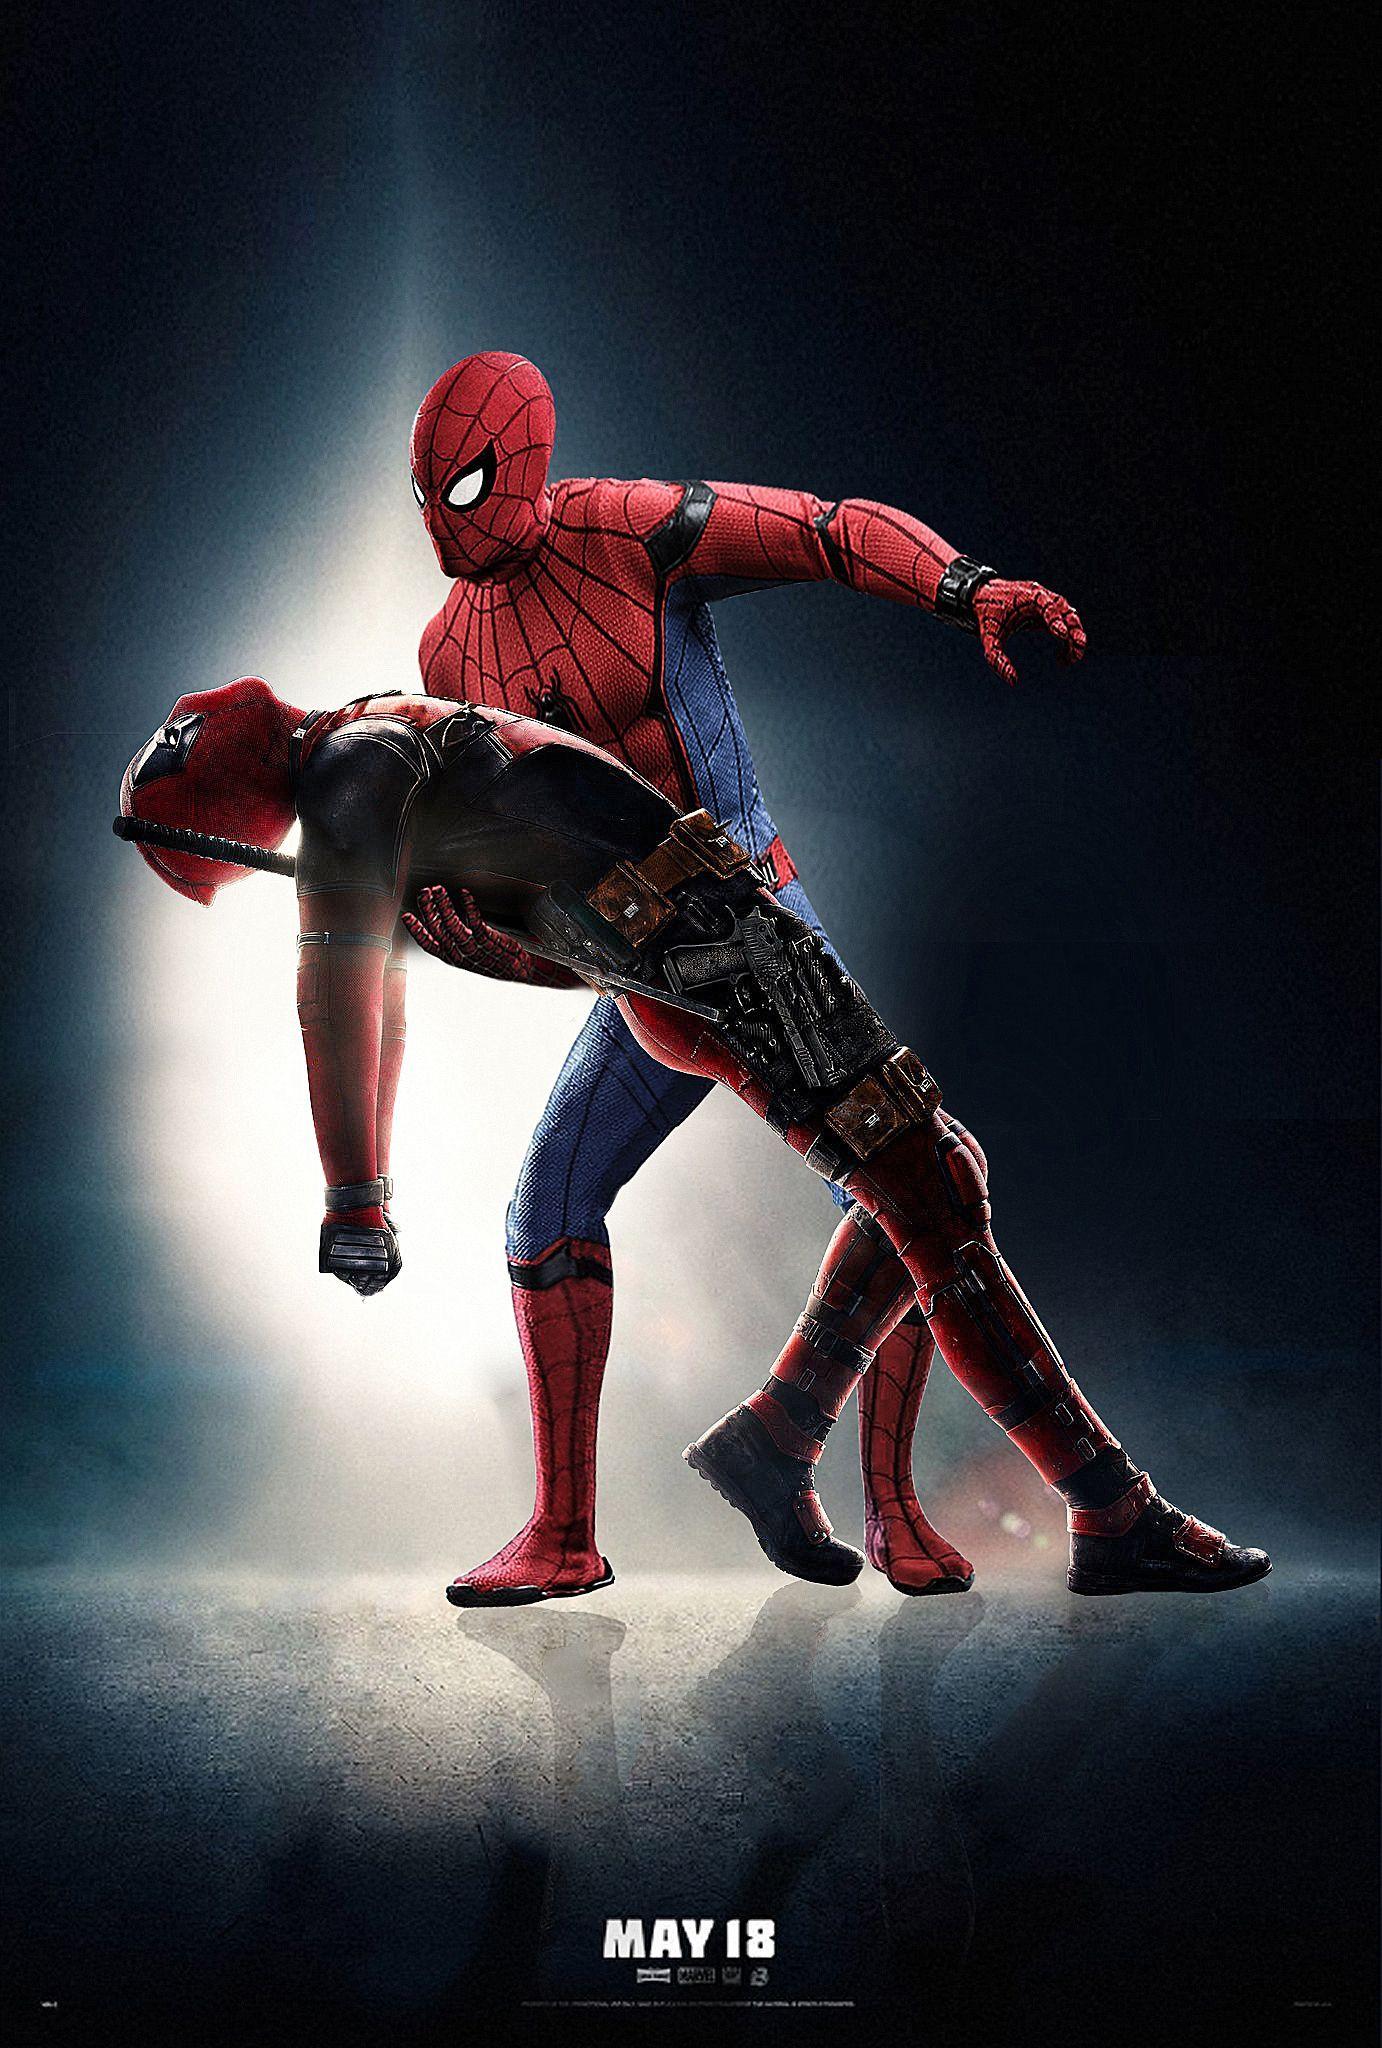 Spiderman Funny Wallpaper : spiderman, funny, wallpaper, Jabba, *-Dis~MVL:, Parody, Deadpool, Spiderman,, Wallpaper, Funny,, Spiderman, Funny